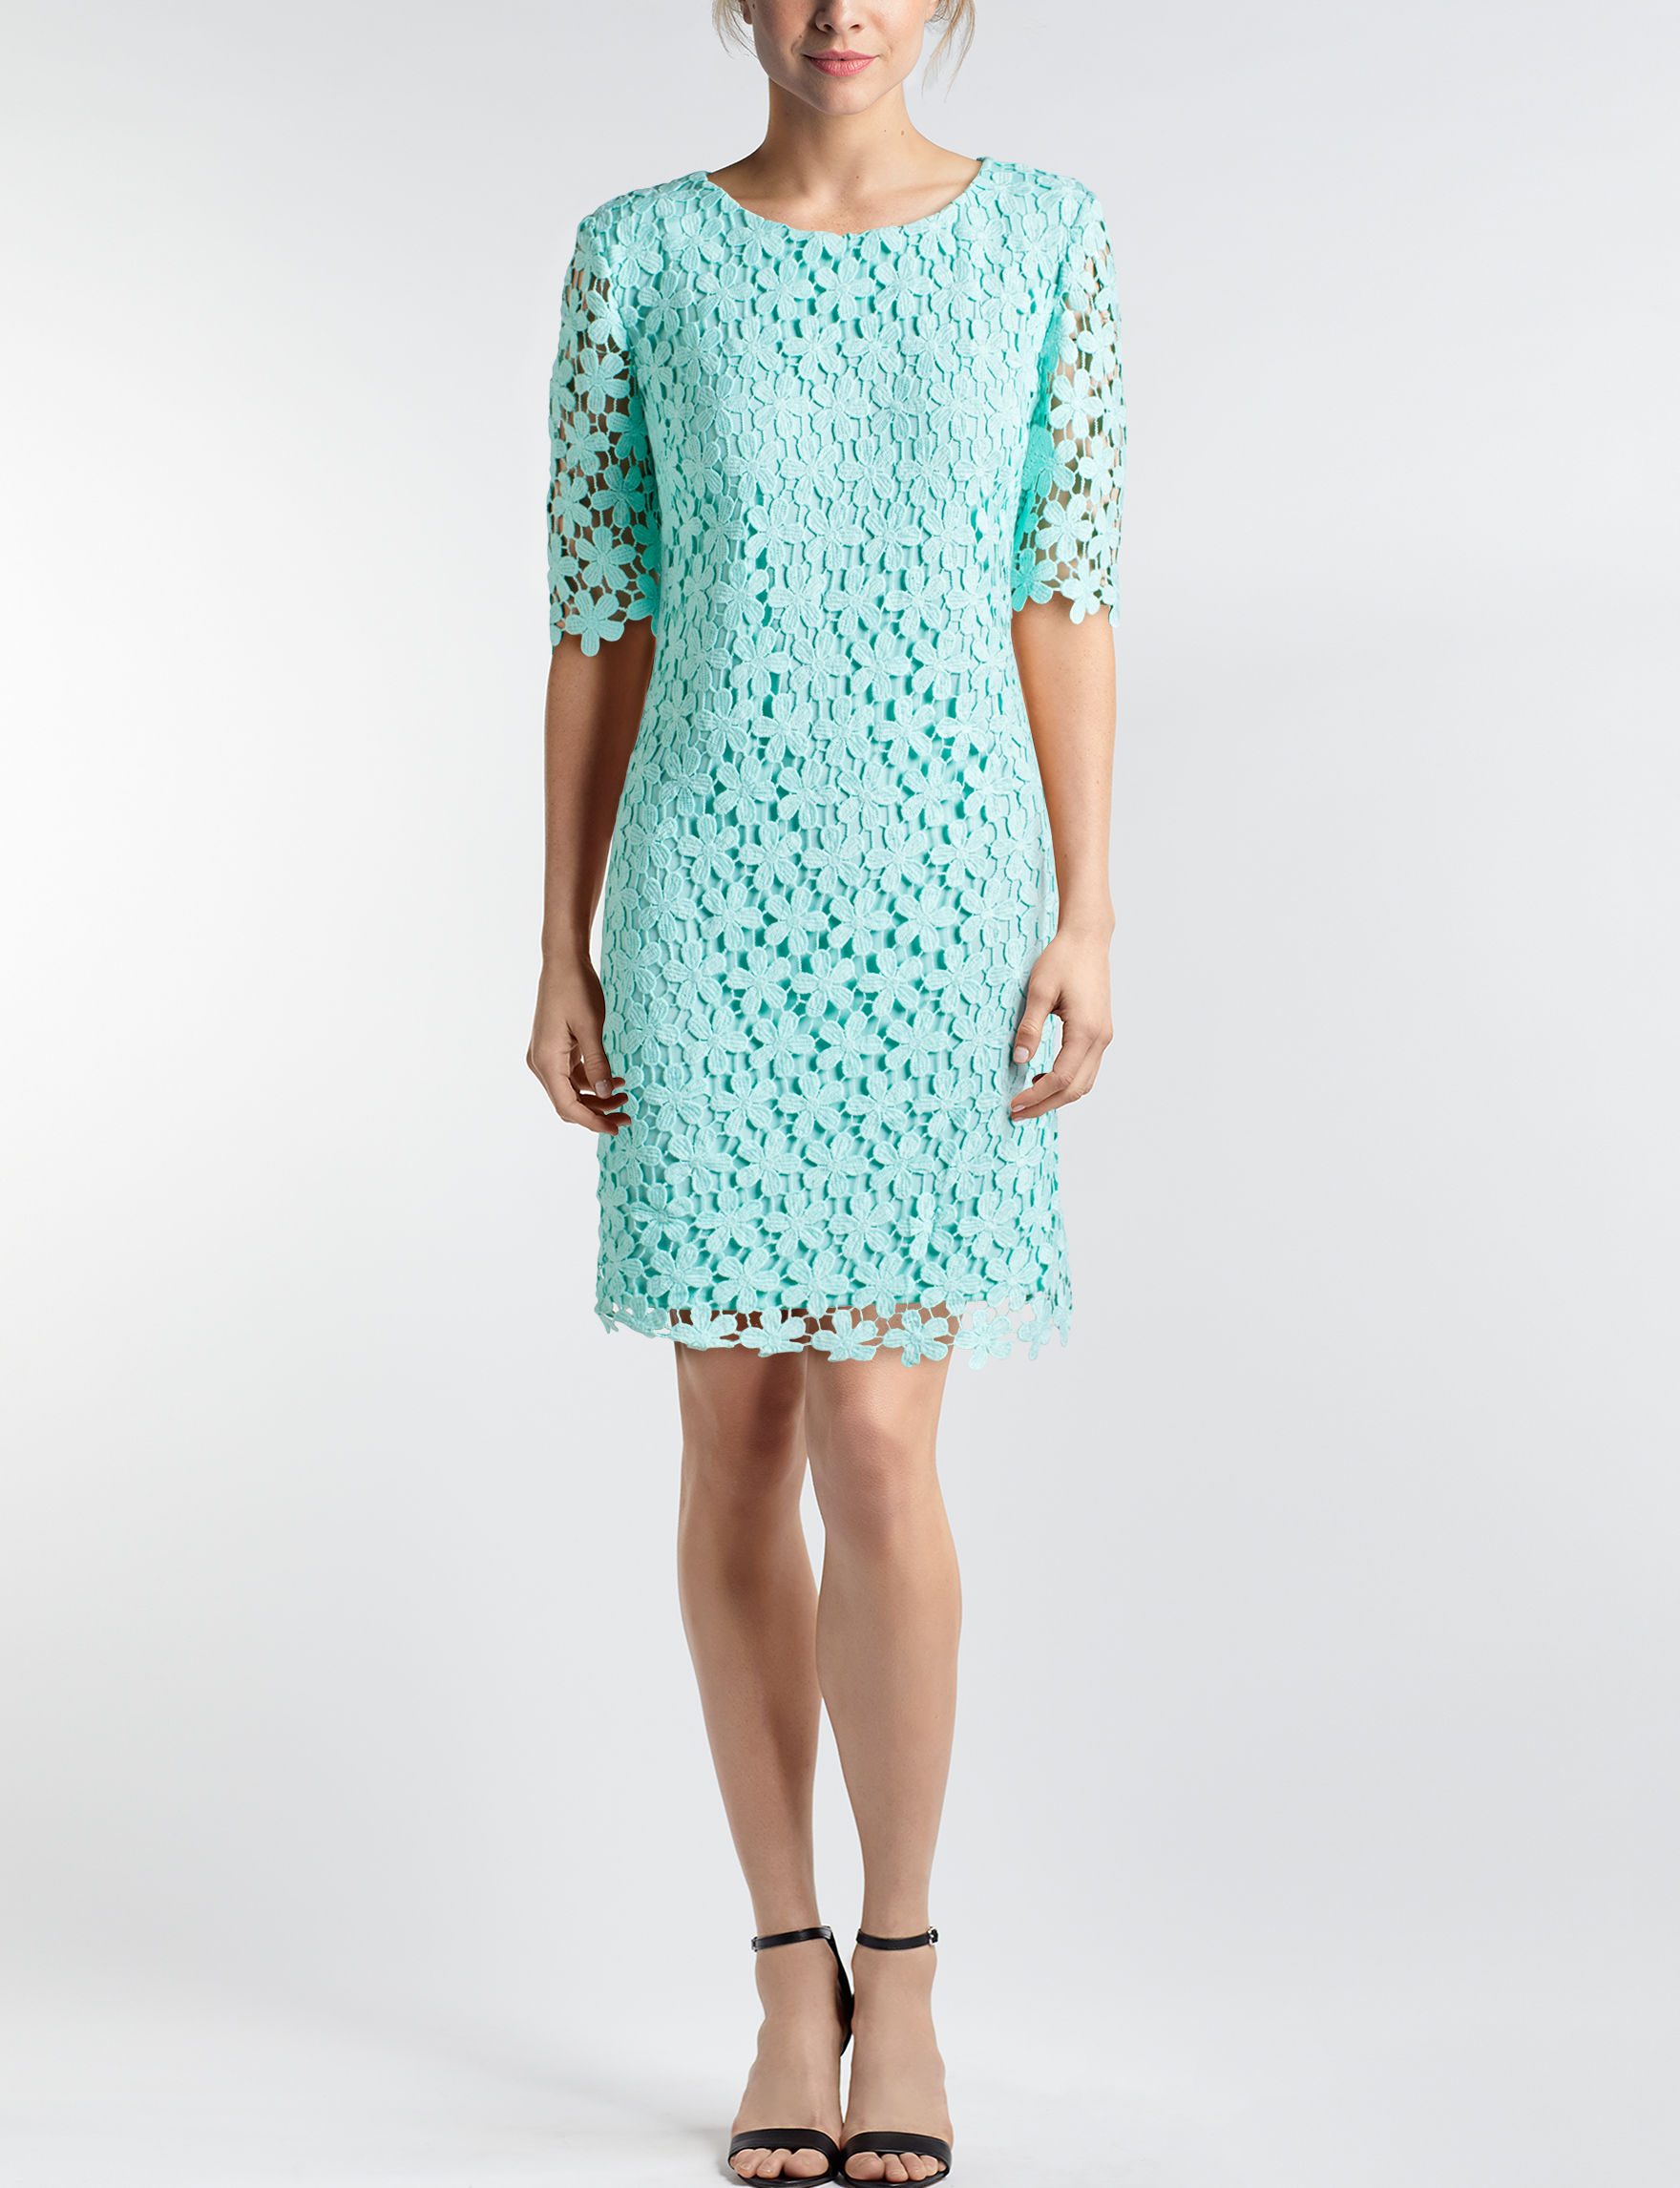 Madison Leigh Mint Sheath Dresses